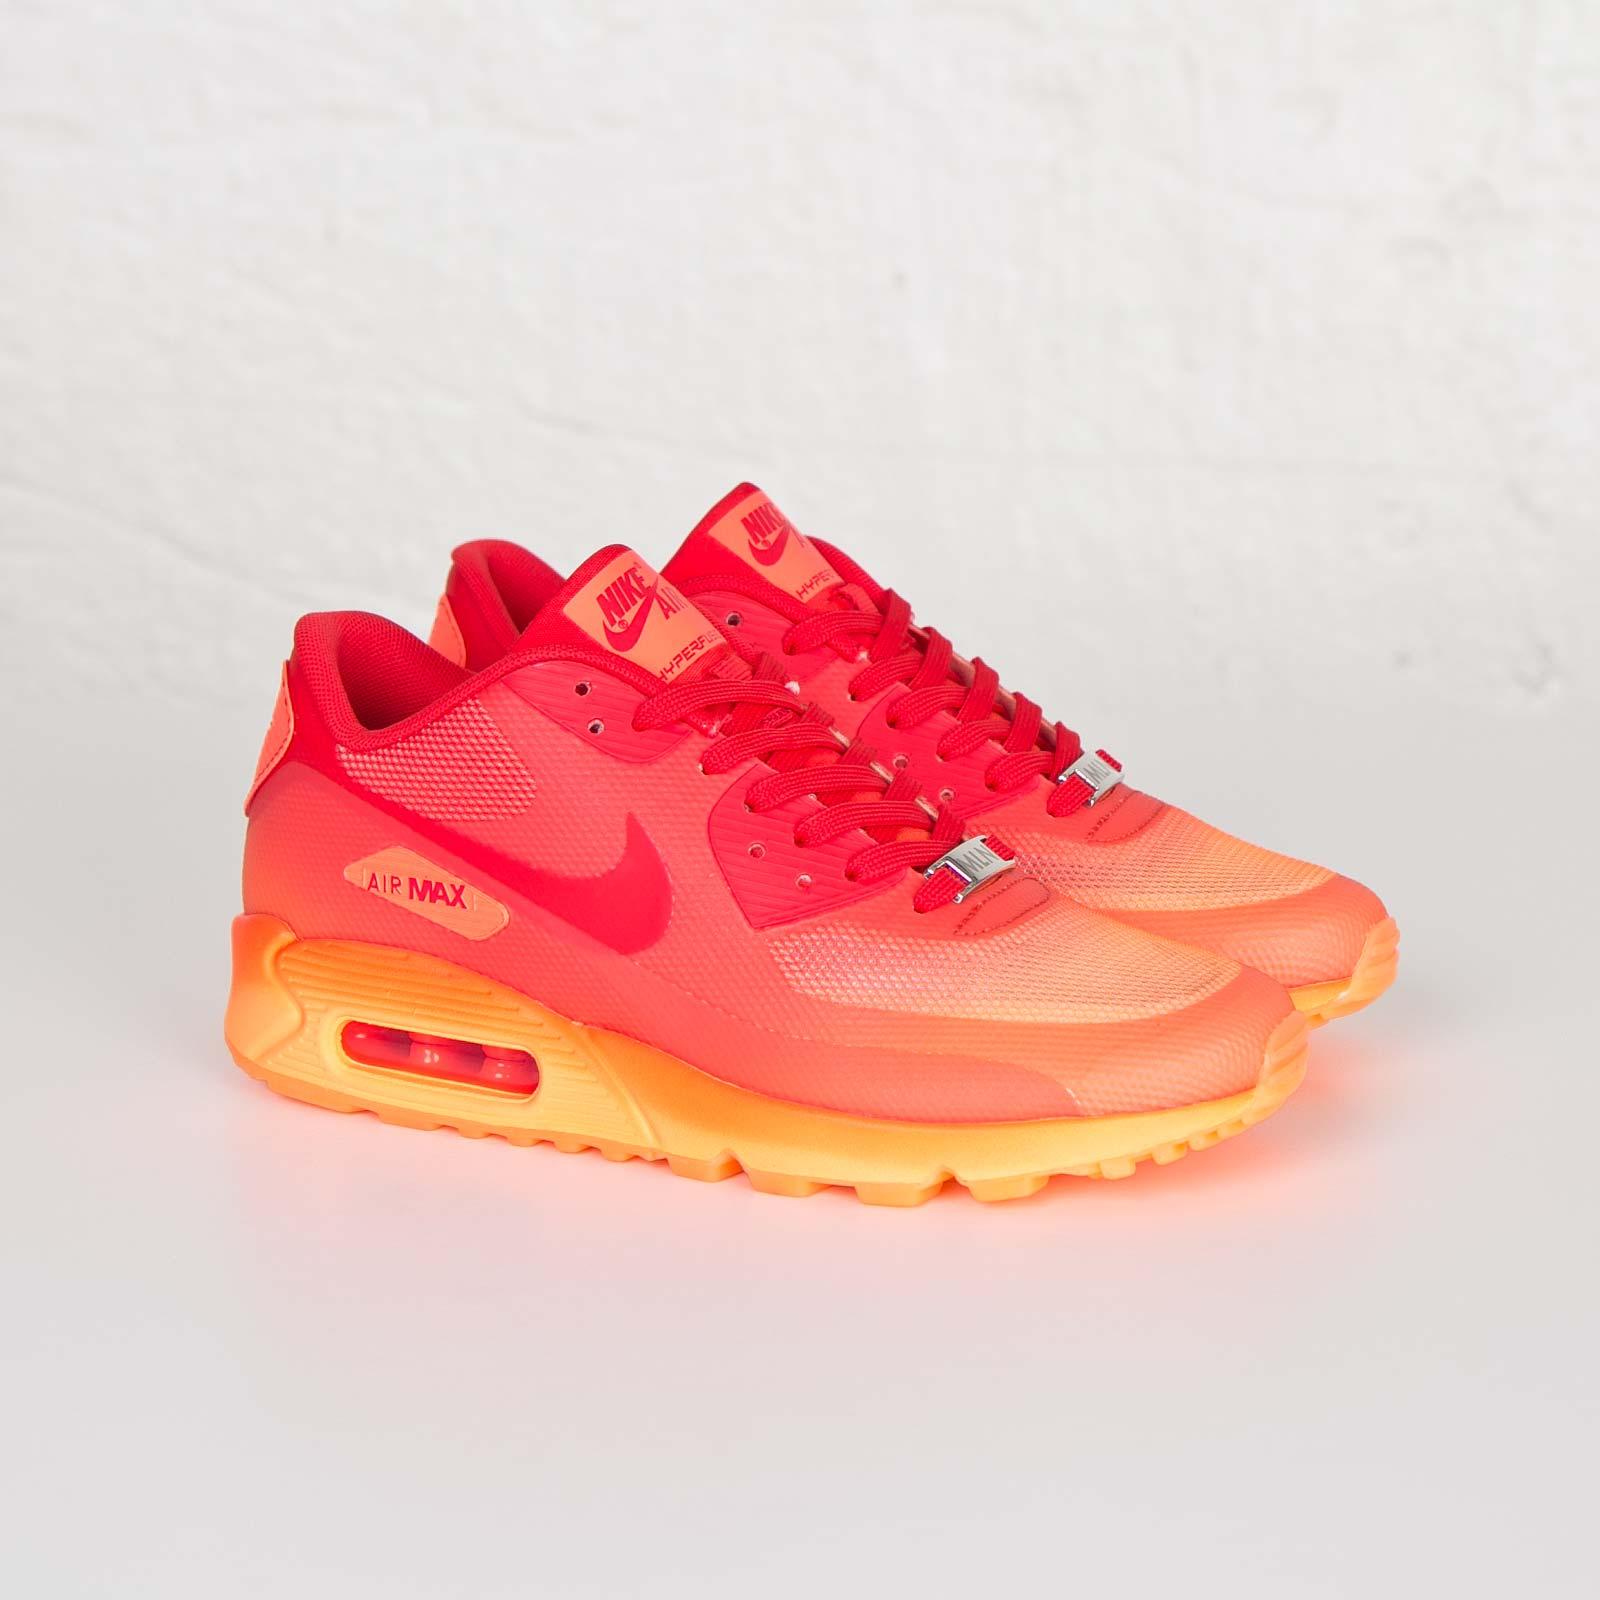 Nike Wmns Air Max 90 Hyp QS 813151 800 Sneakersnstuff